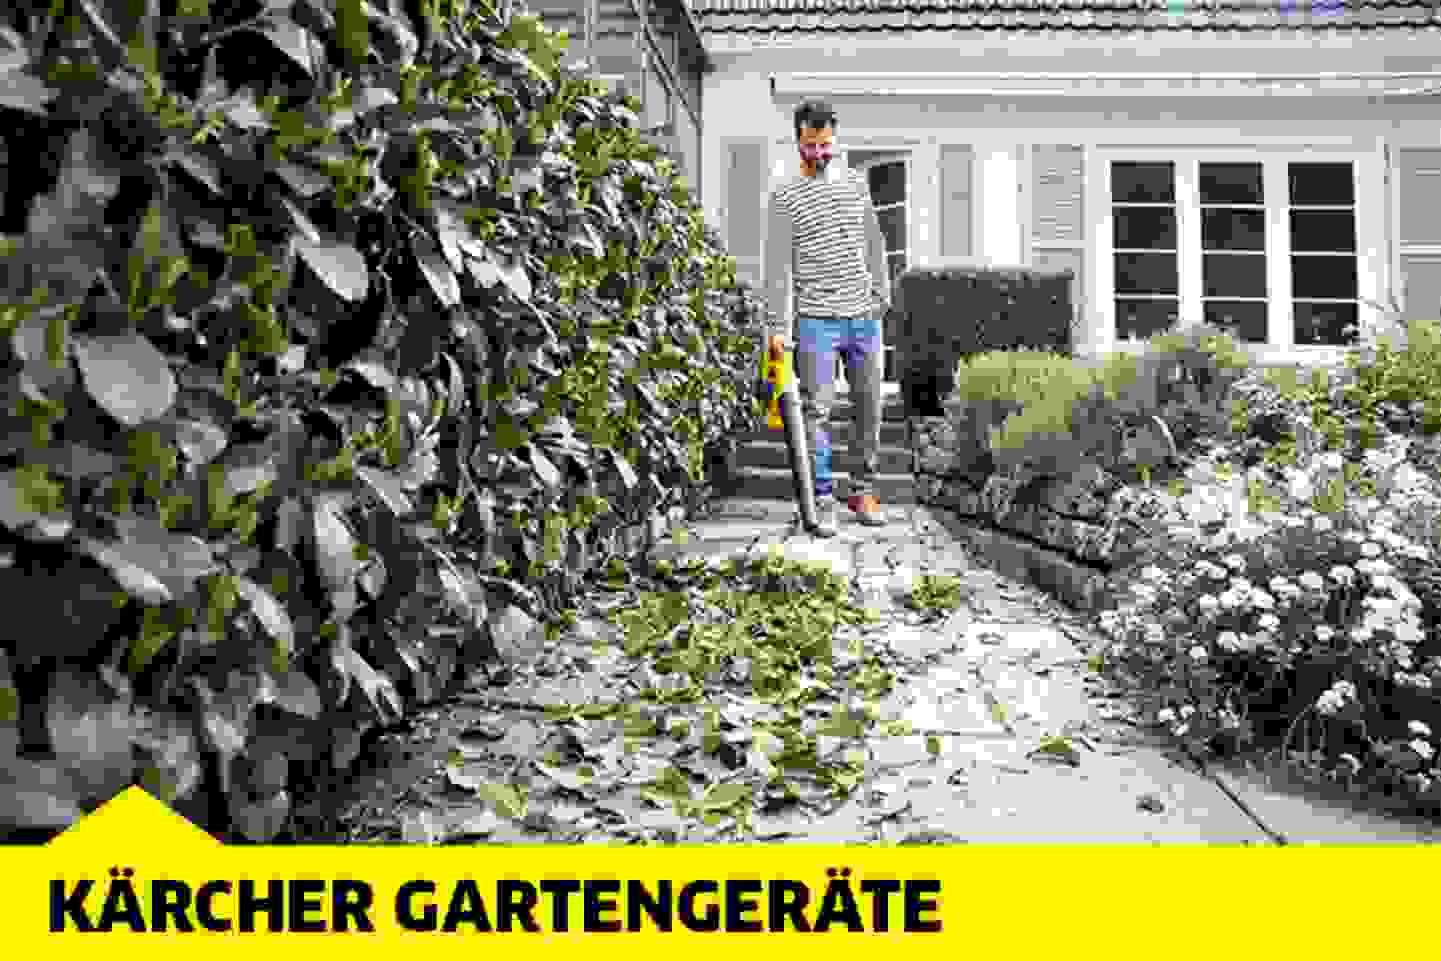 Kärcher Gartengeräte